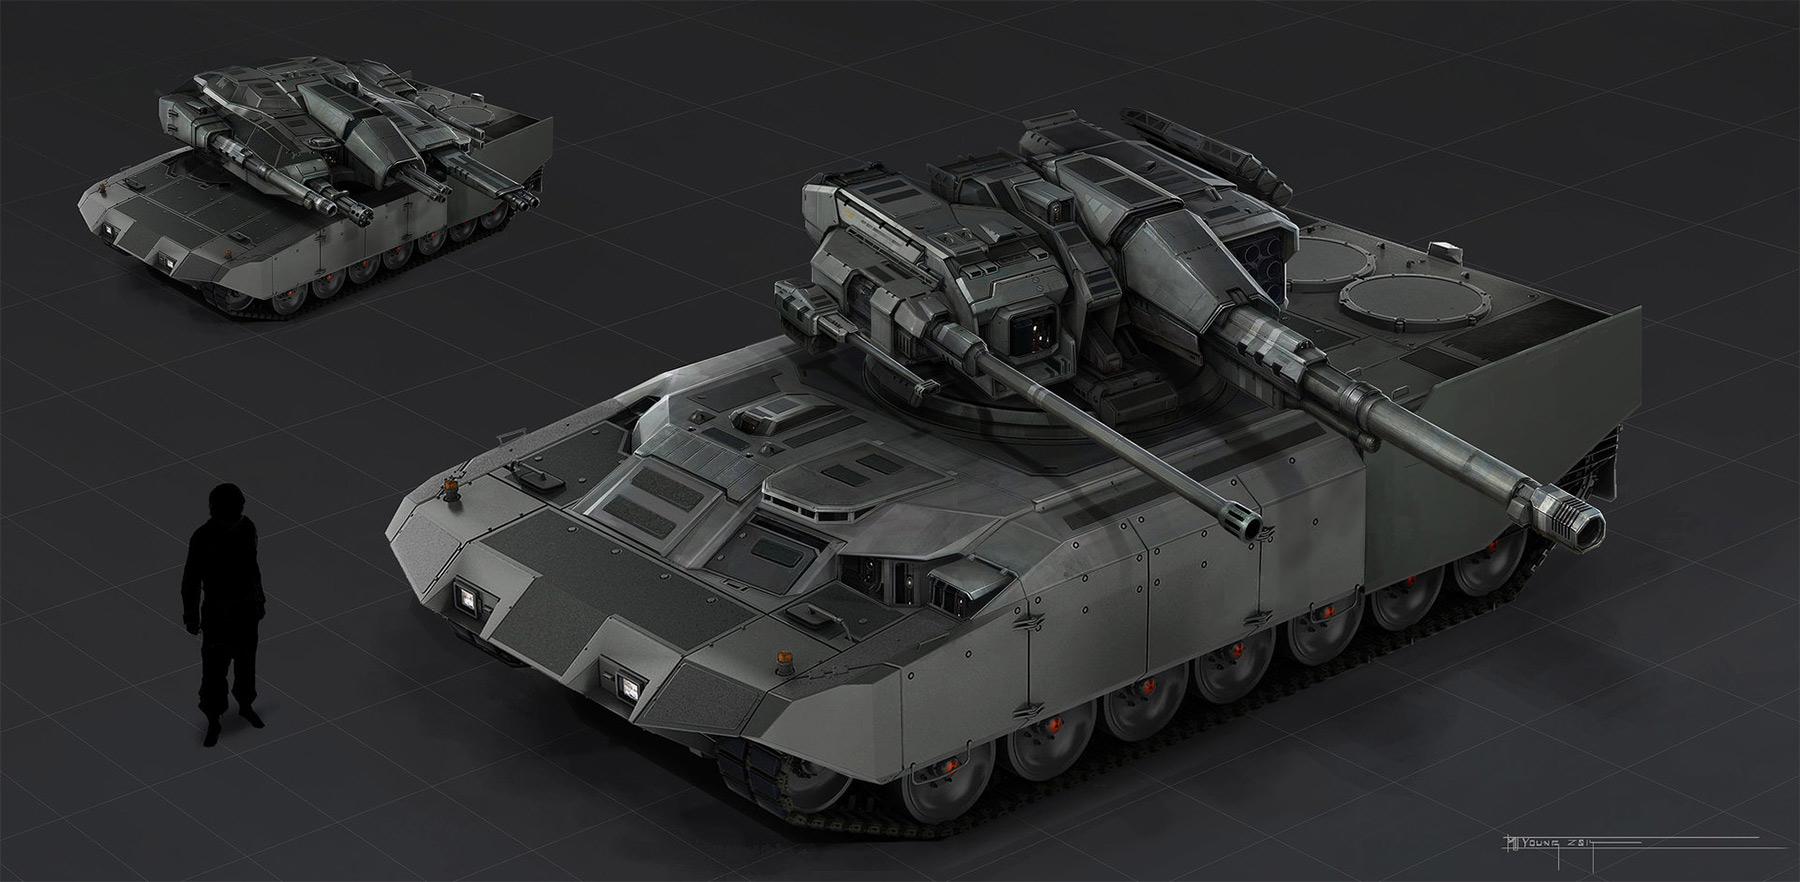 Tank Architecture And Interior Design: Concept Tanks